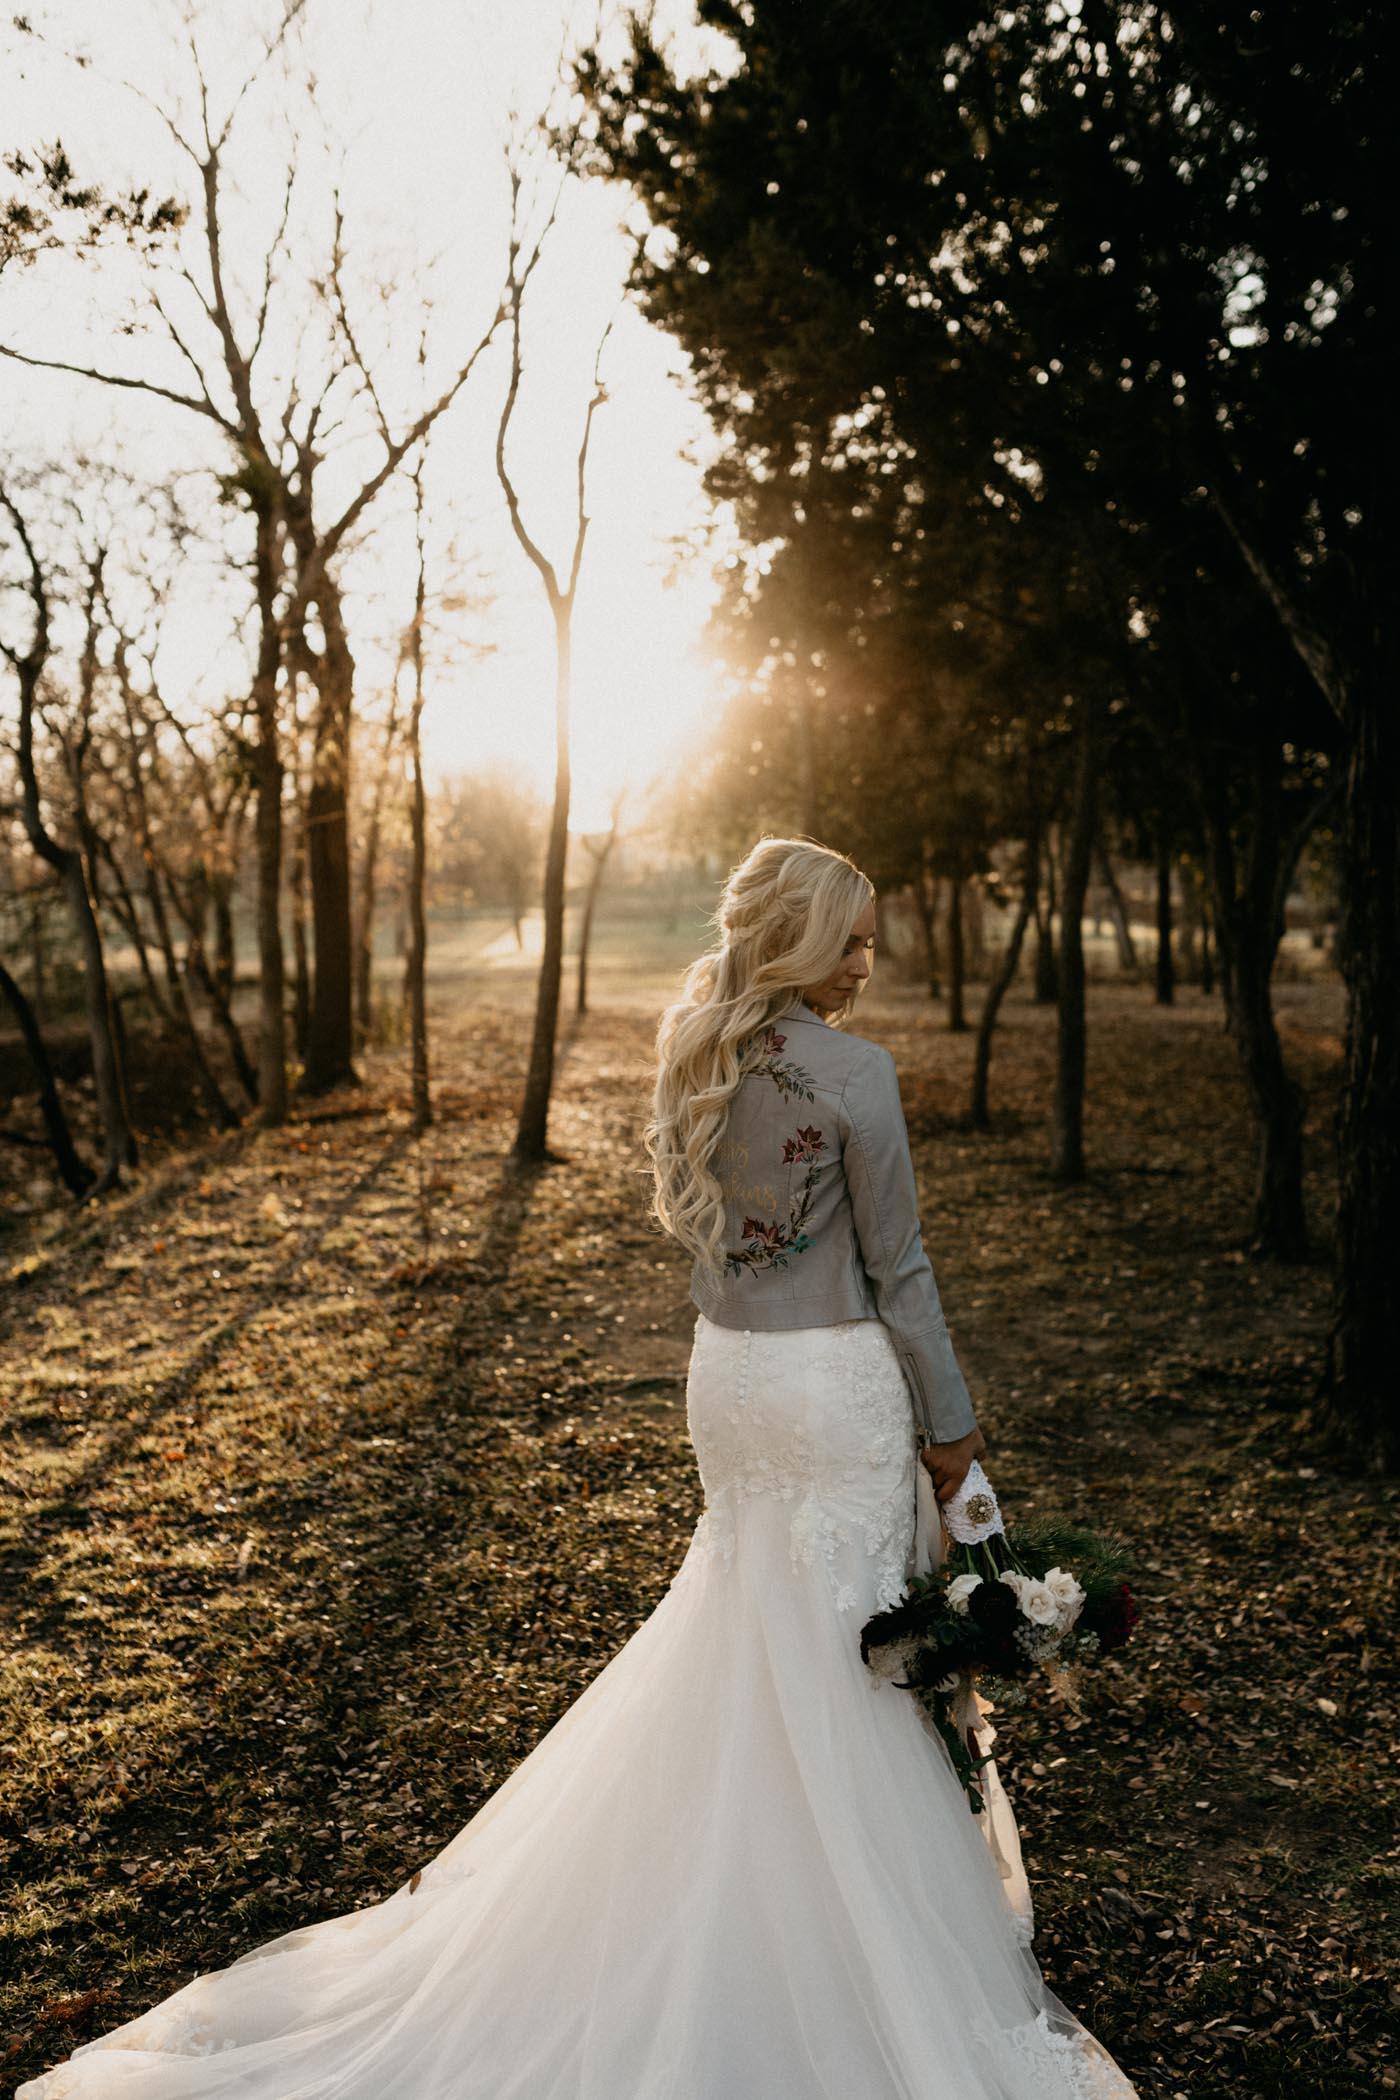 portrait of bride wearing blue leather jacket on wedding day